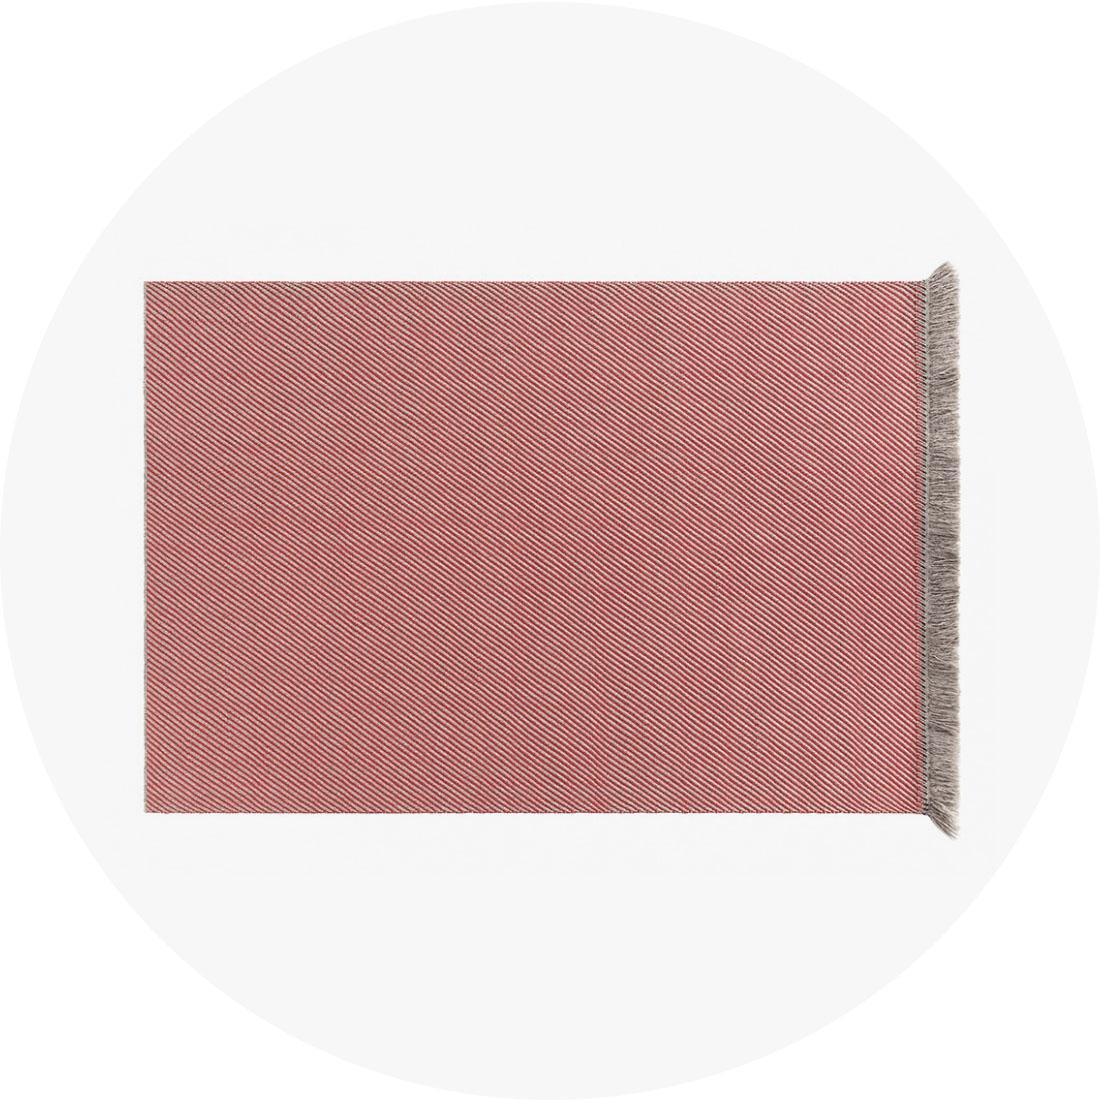 outdoor_gl-blue-rug-diag-almond-red-890x650_R.jpg